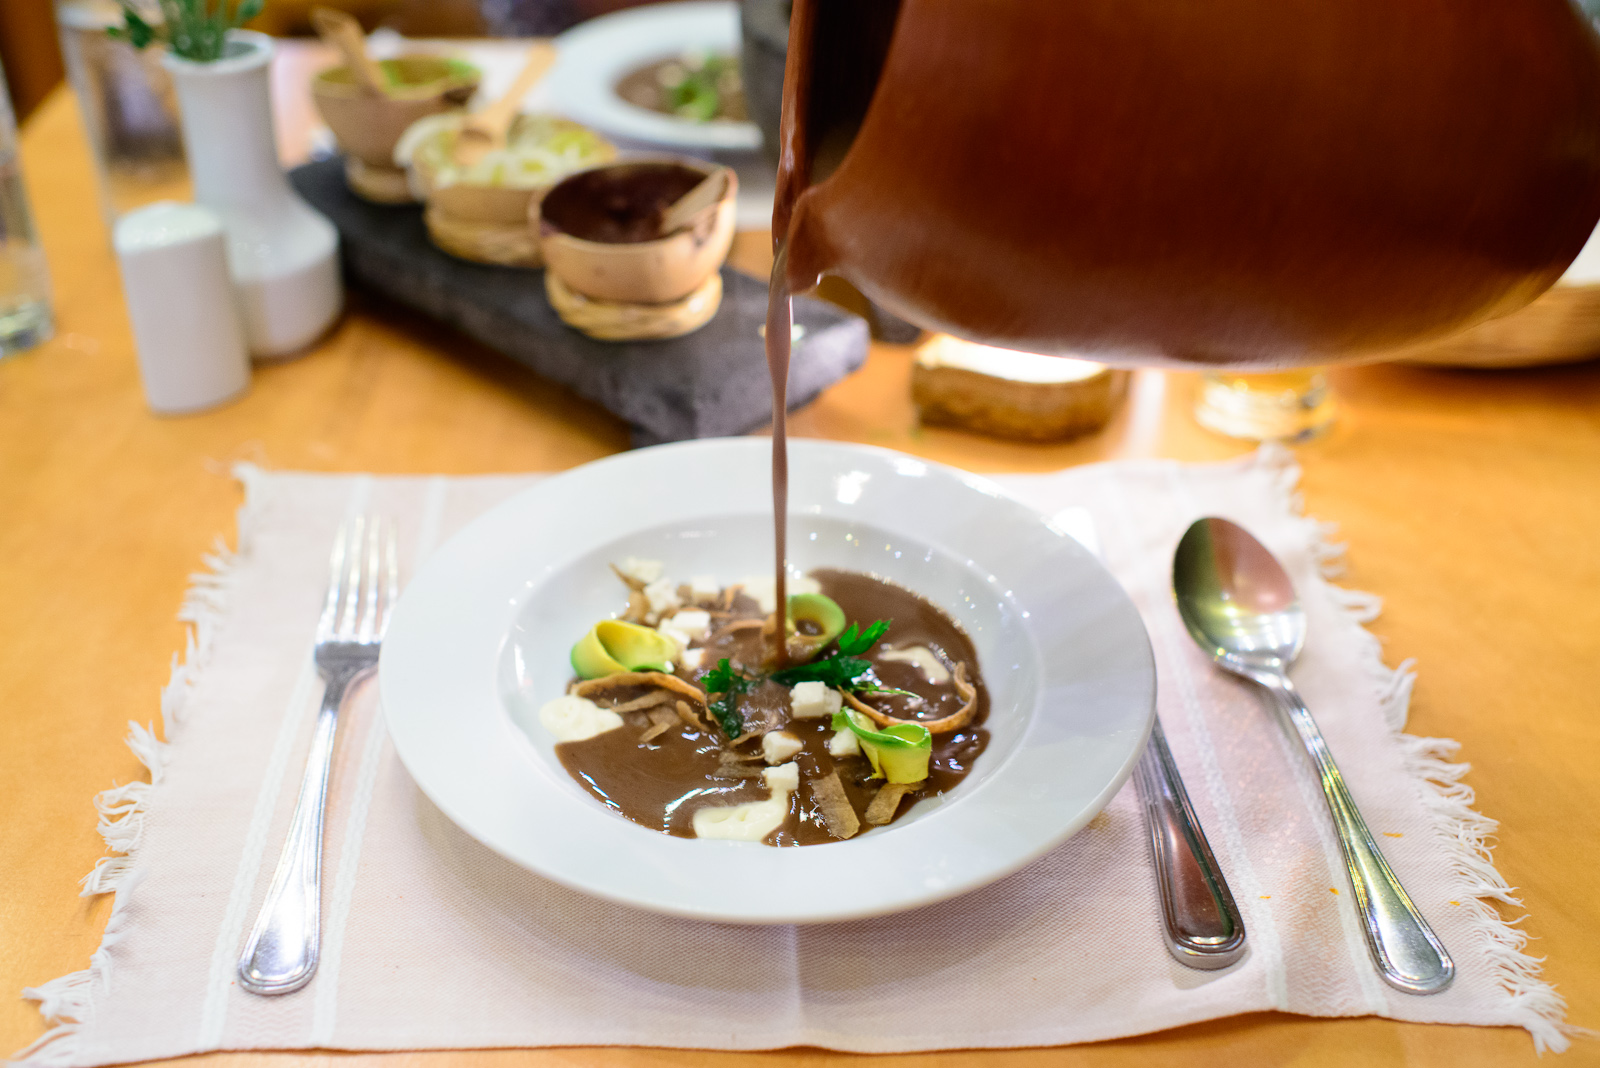 Sopa frijolón con hierba de conejo (Bean soup with rabbit herb)